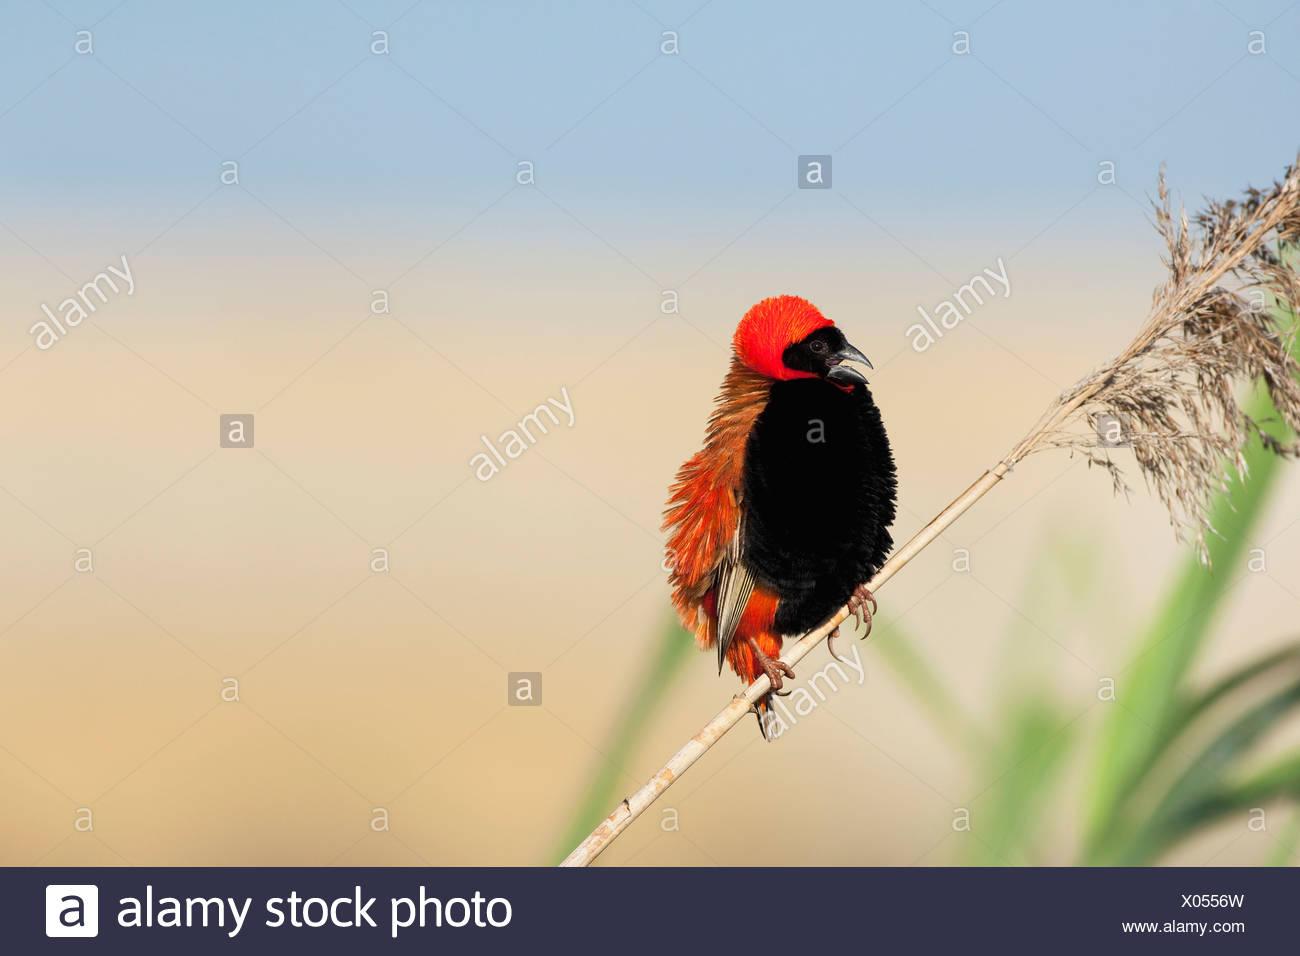 Red Bishop (Euplectes orix) male portrait, Gauteng Province, South Africa - Stock Image